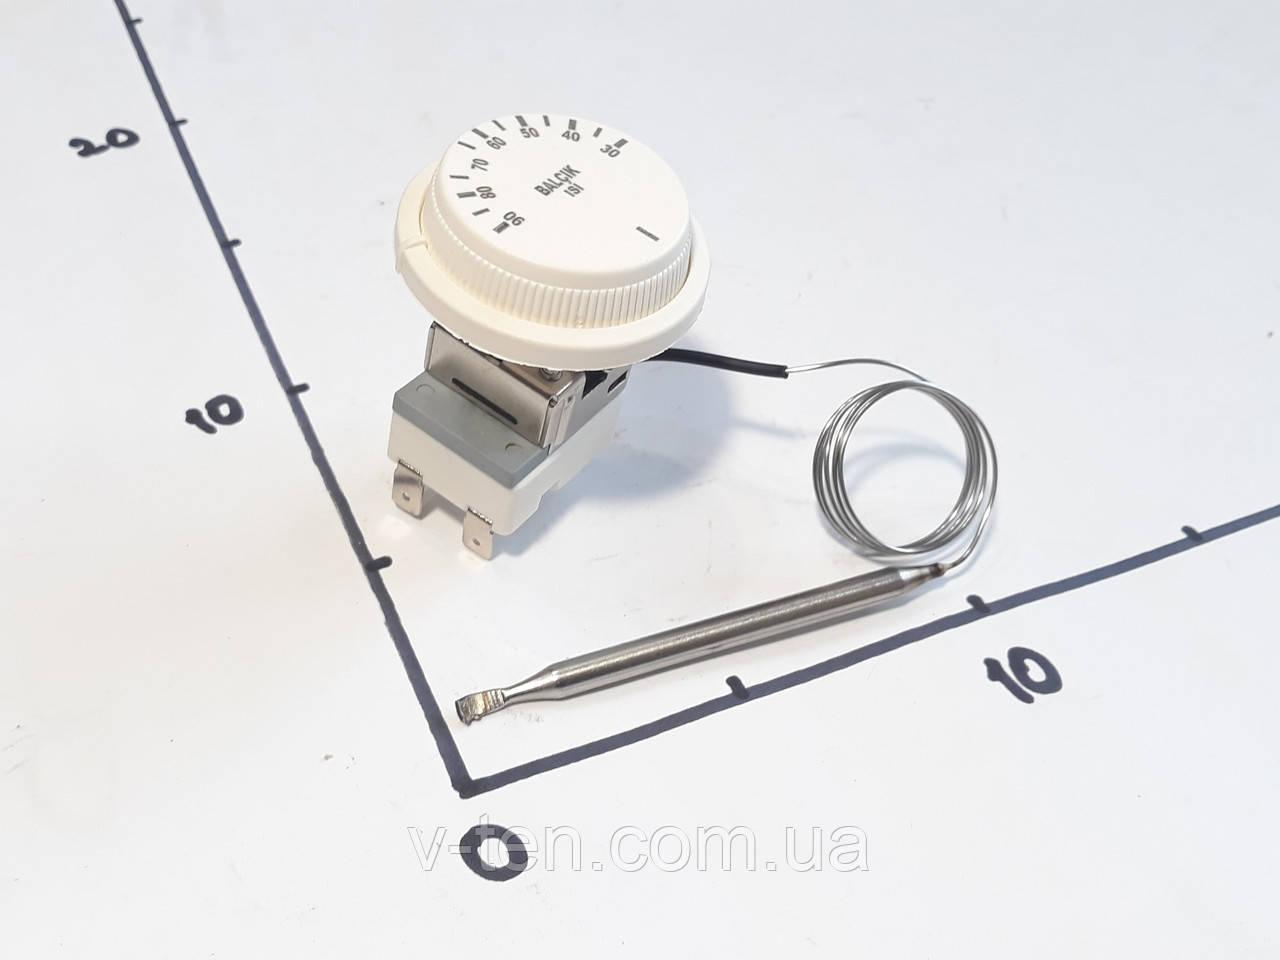 Терморегулятор 50-300°C  капиллярный Balcik (Турция)